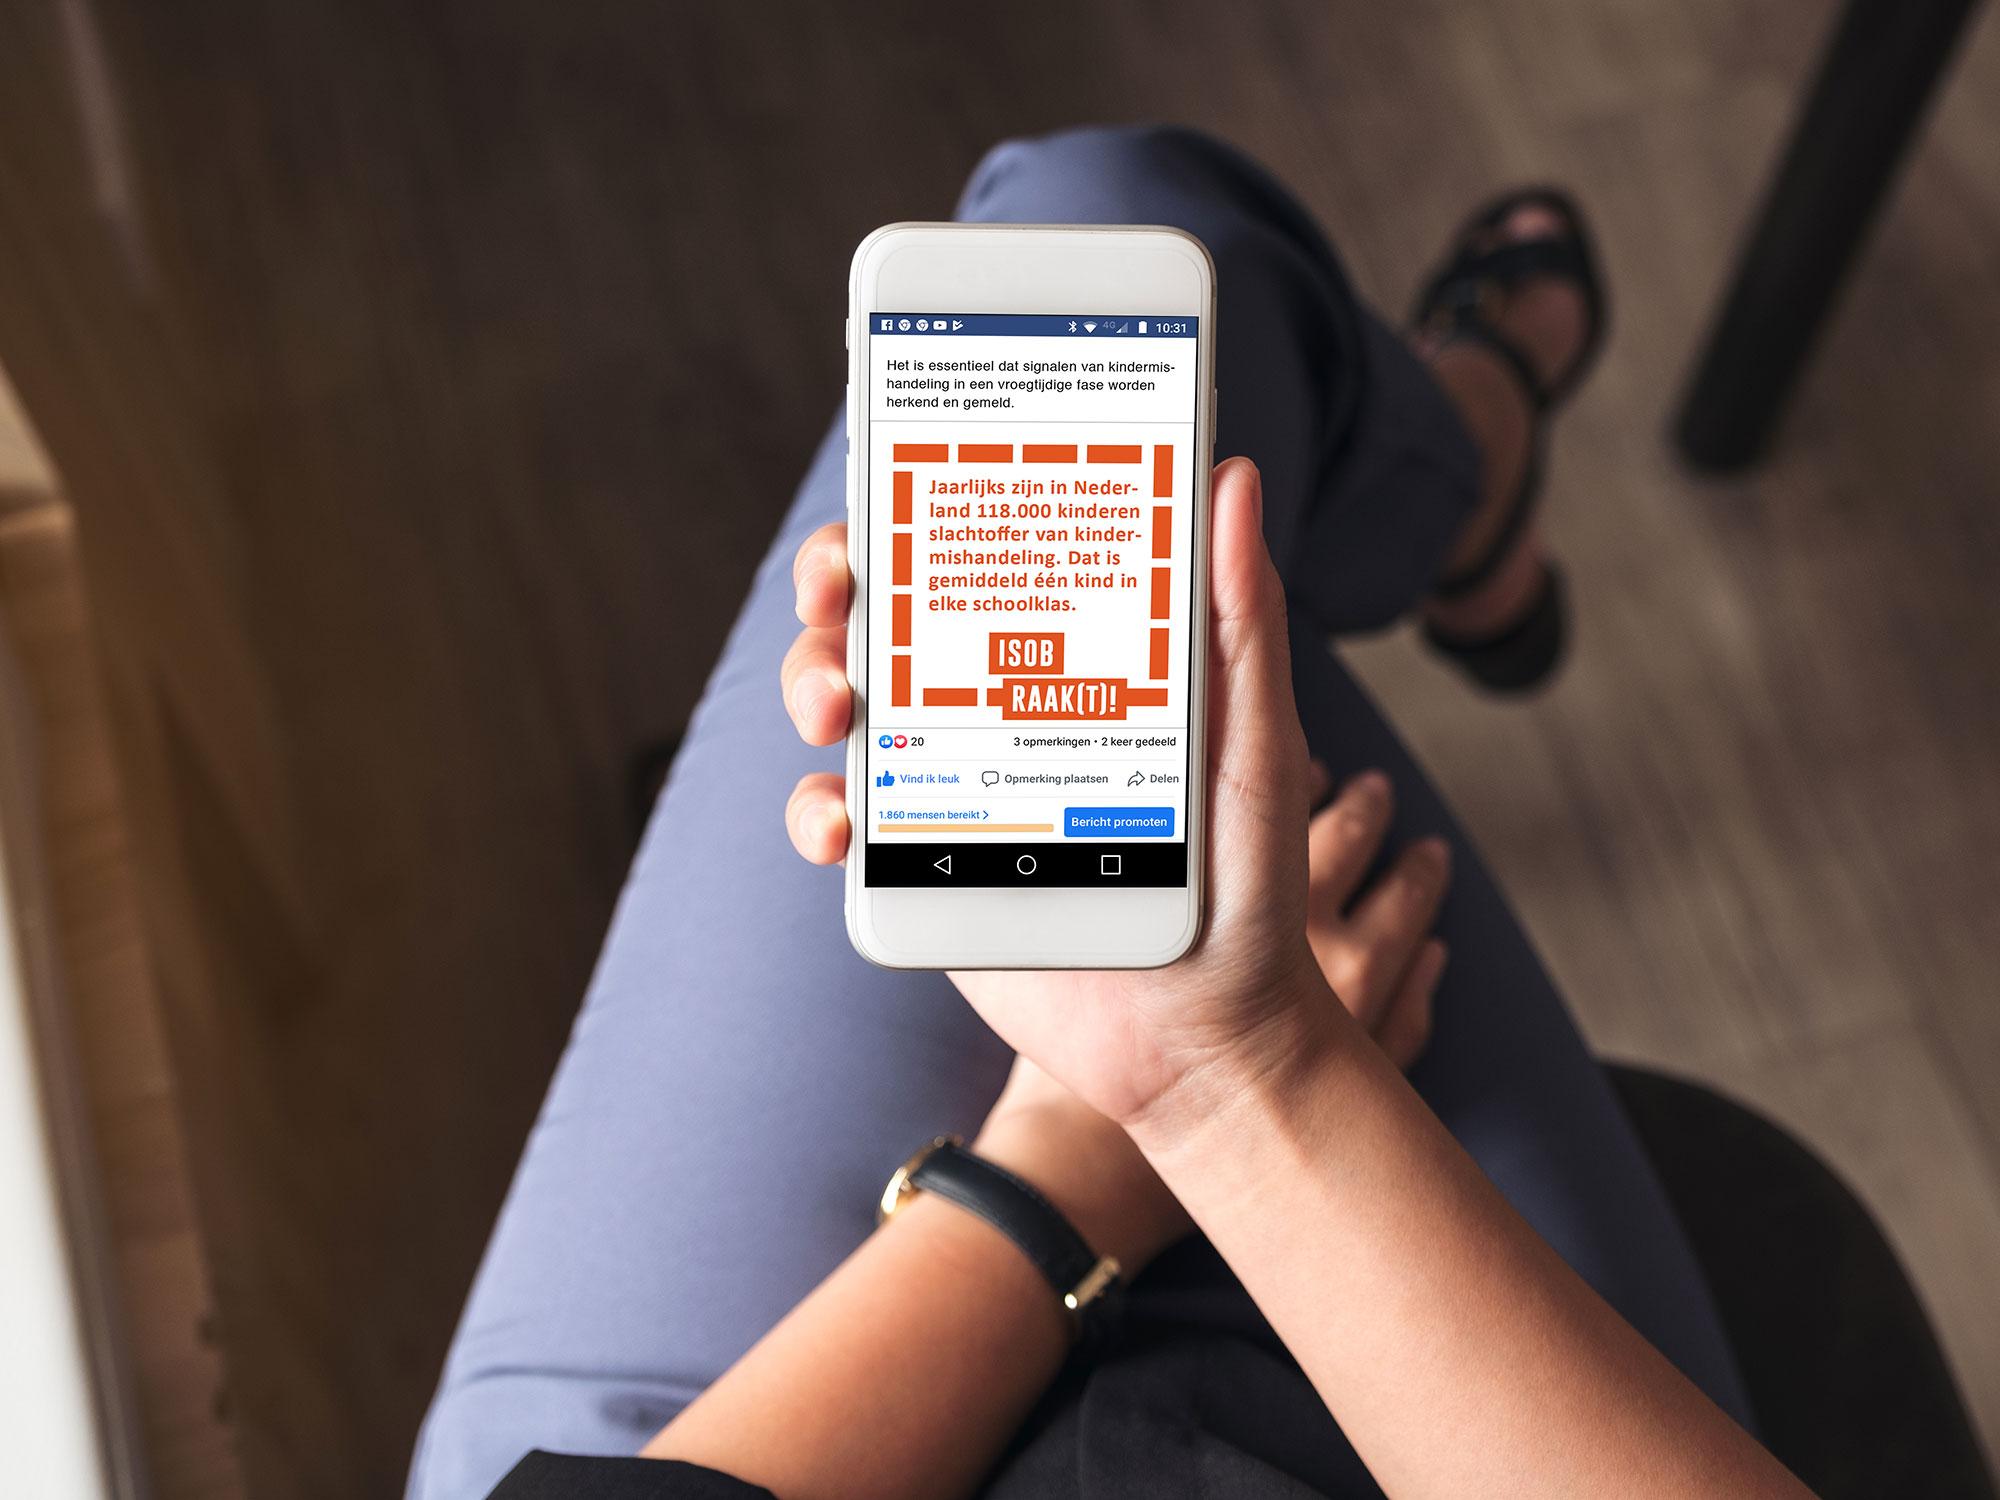 Impulsar-ISOB-Raakt-Smartphone